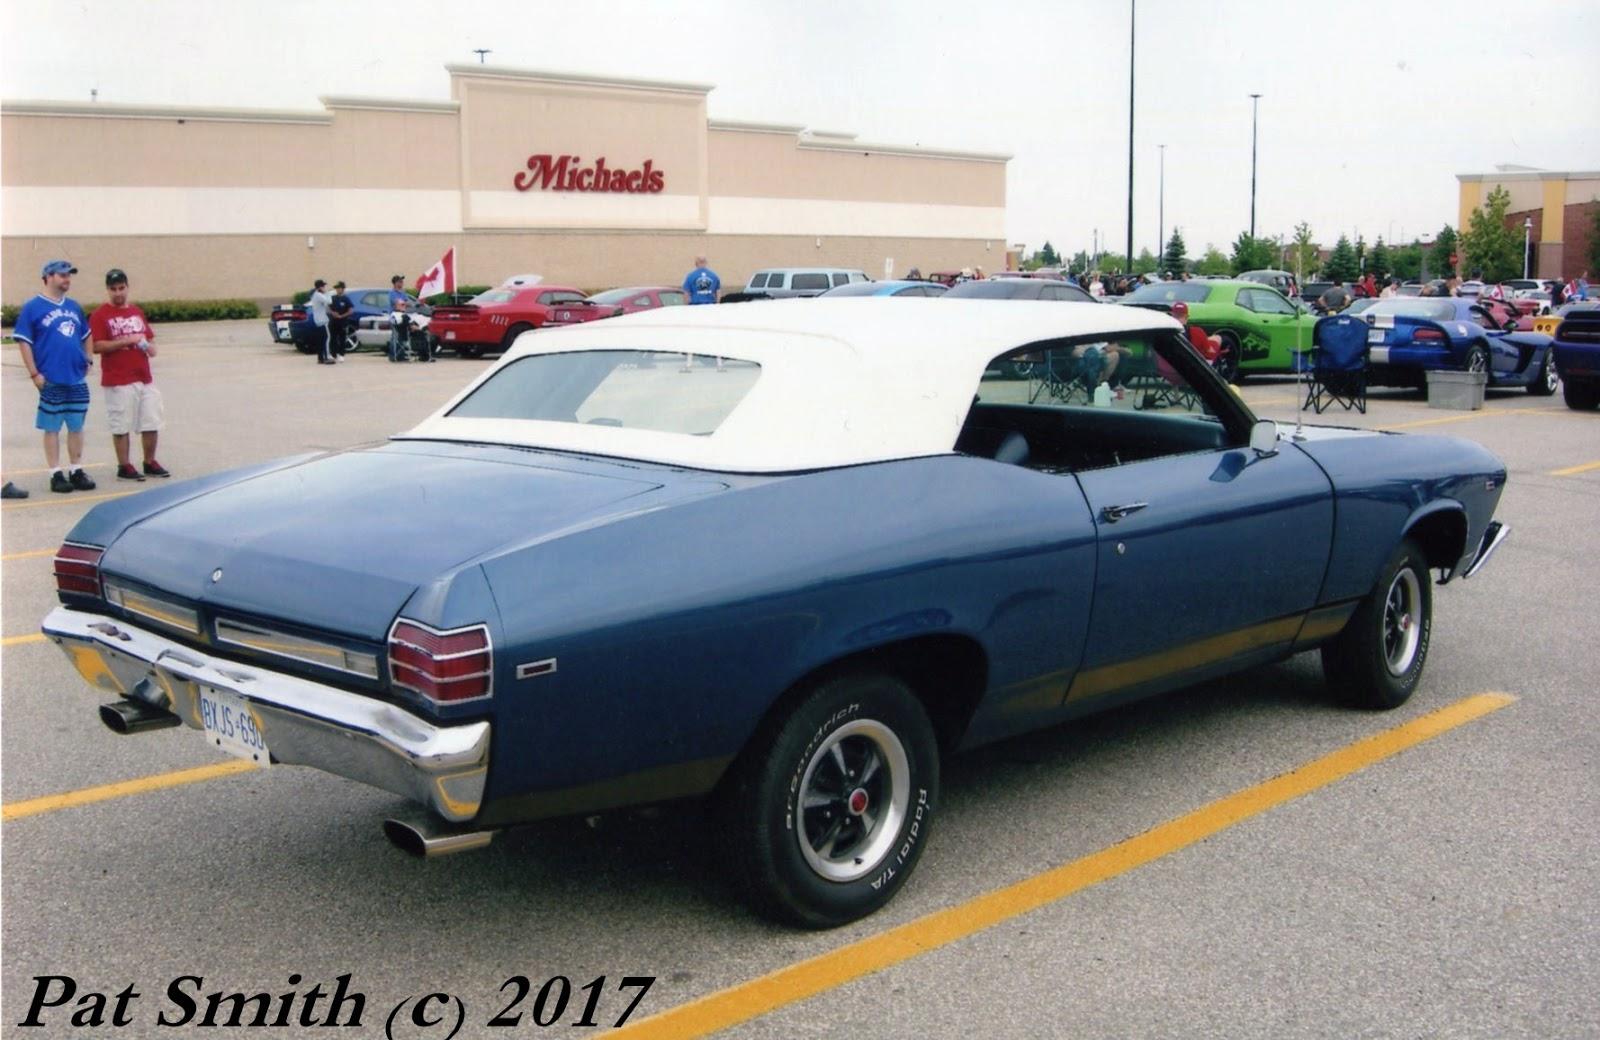 Miraculous Canadian Classic 1969 Beaumont Convertible Phscollectorcarworld Wiring Cloud Hisredienstapotheekhoekschewaardnl